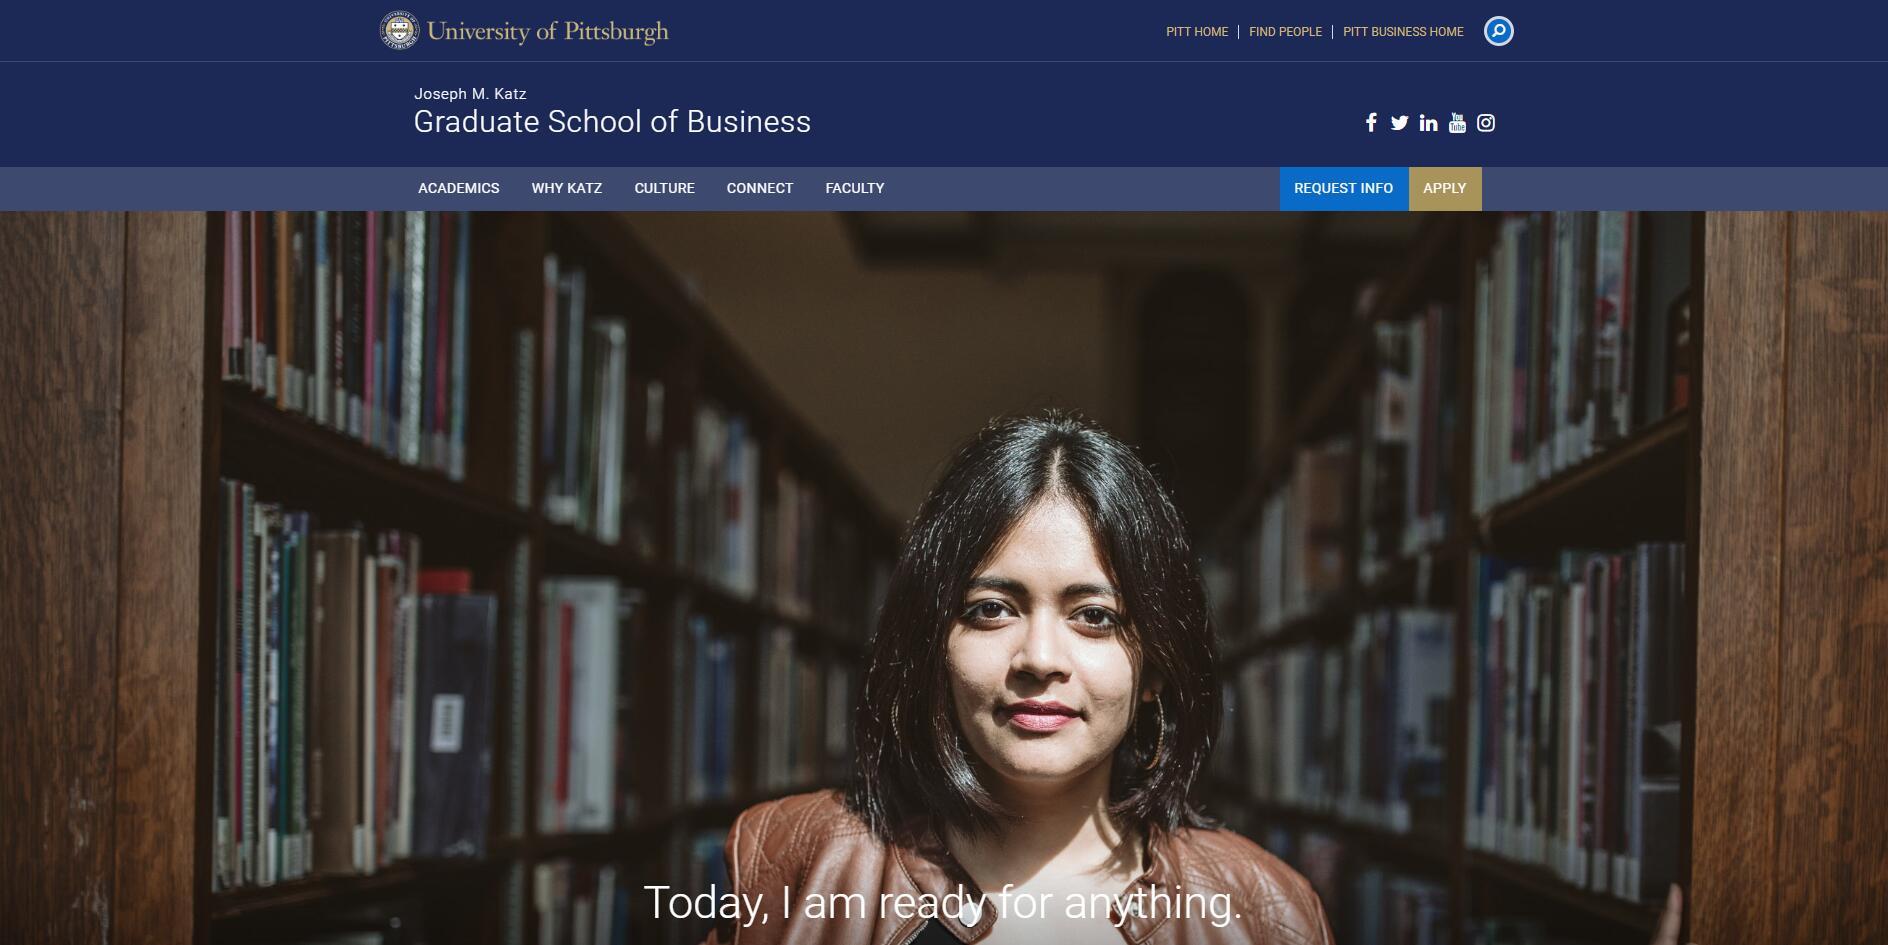 The Katz Graduate School of Business at University of Pittsburgh